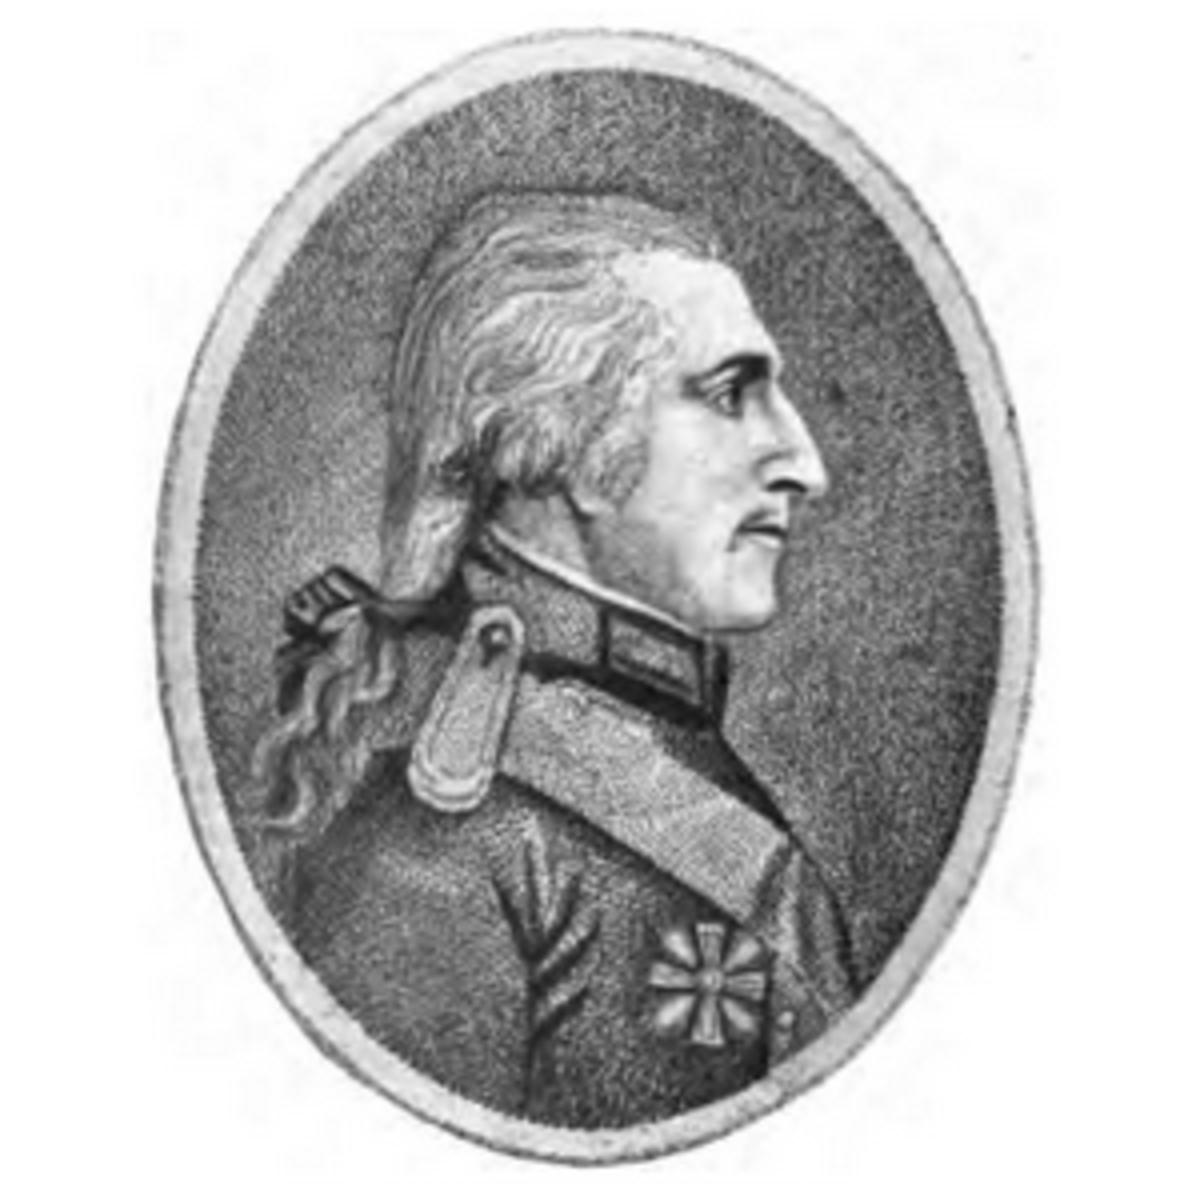 Profile of Count Rumford in uniform.